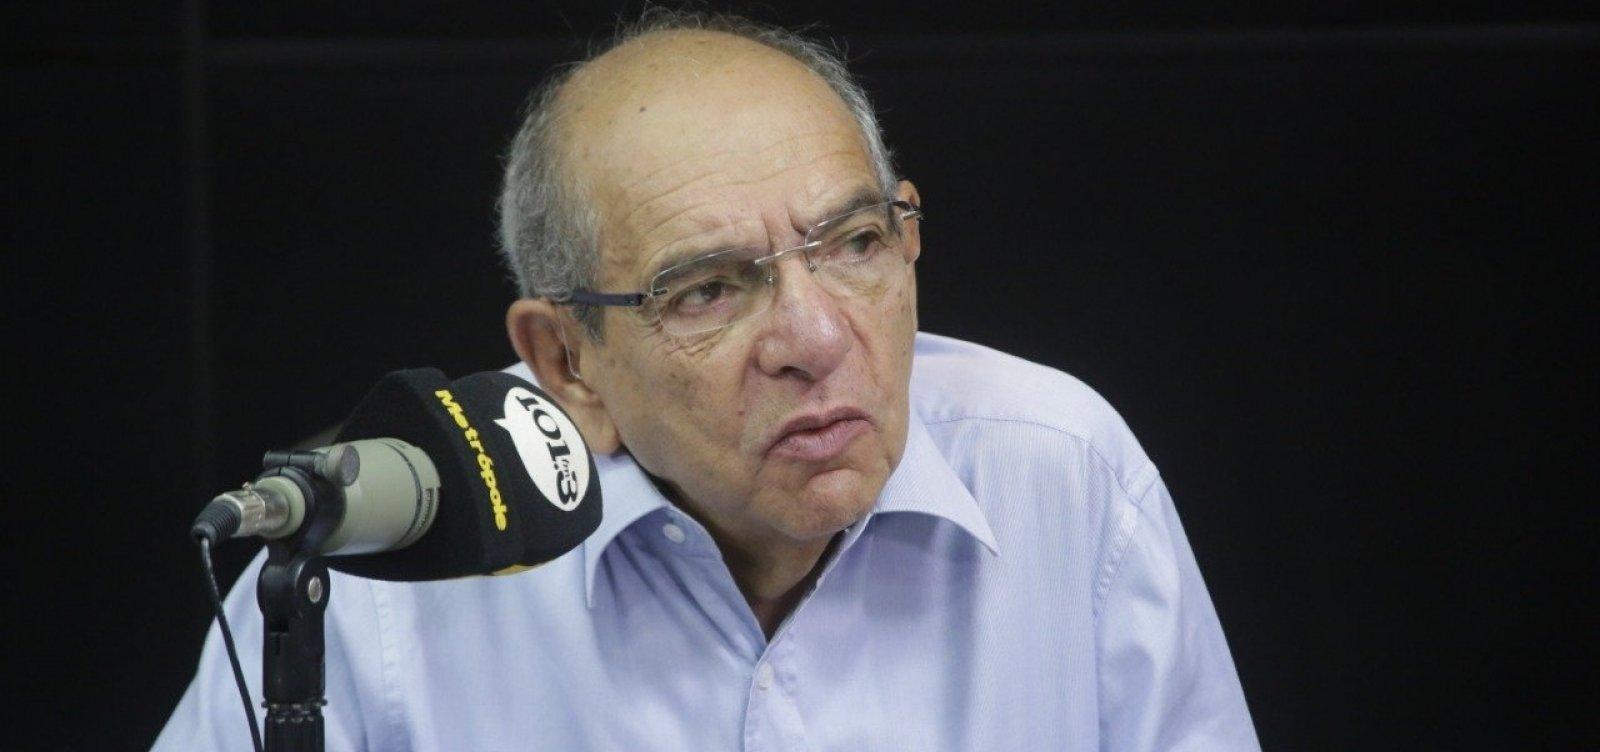 [MK apoia protesto de Caetano contra indústria química em Santo Amaro; ouça]